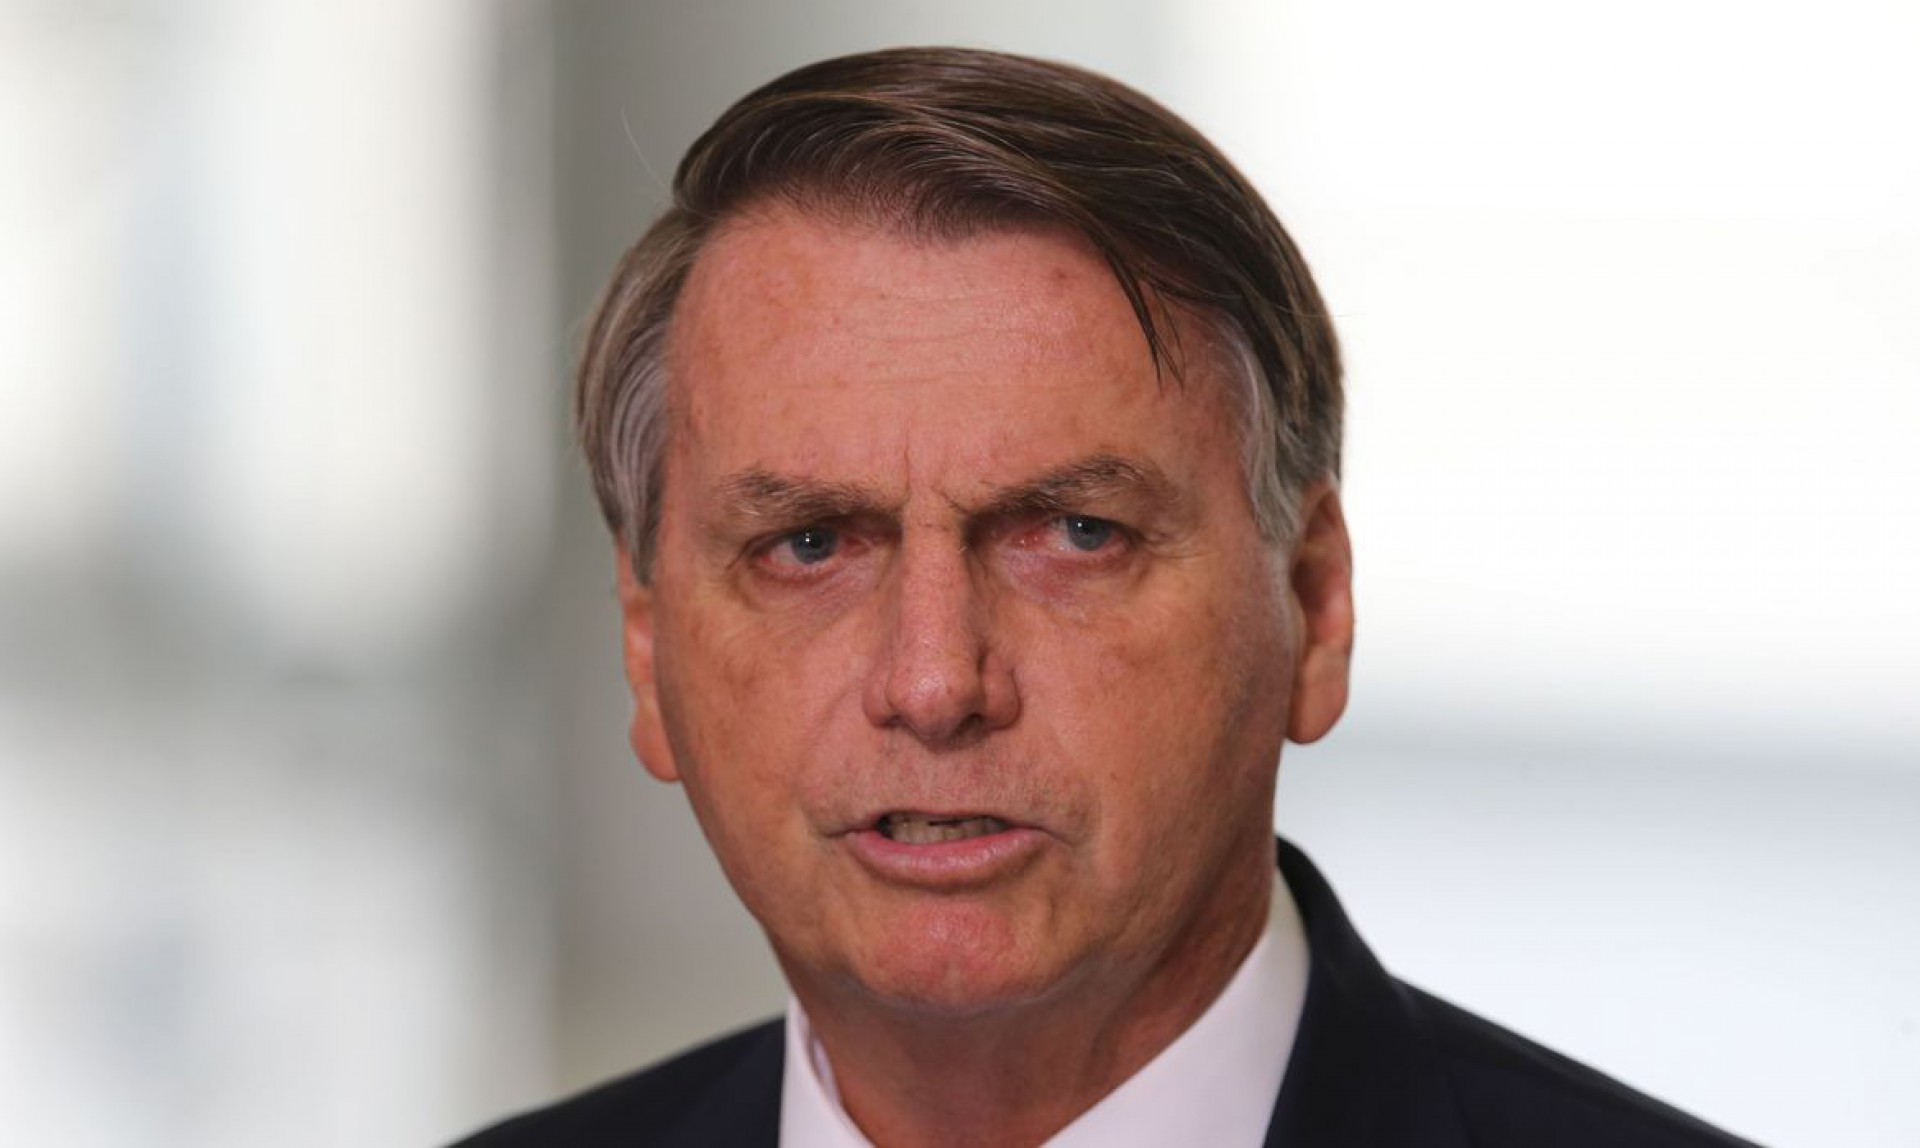 Fantasia do autogolpe de Bolsonaro